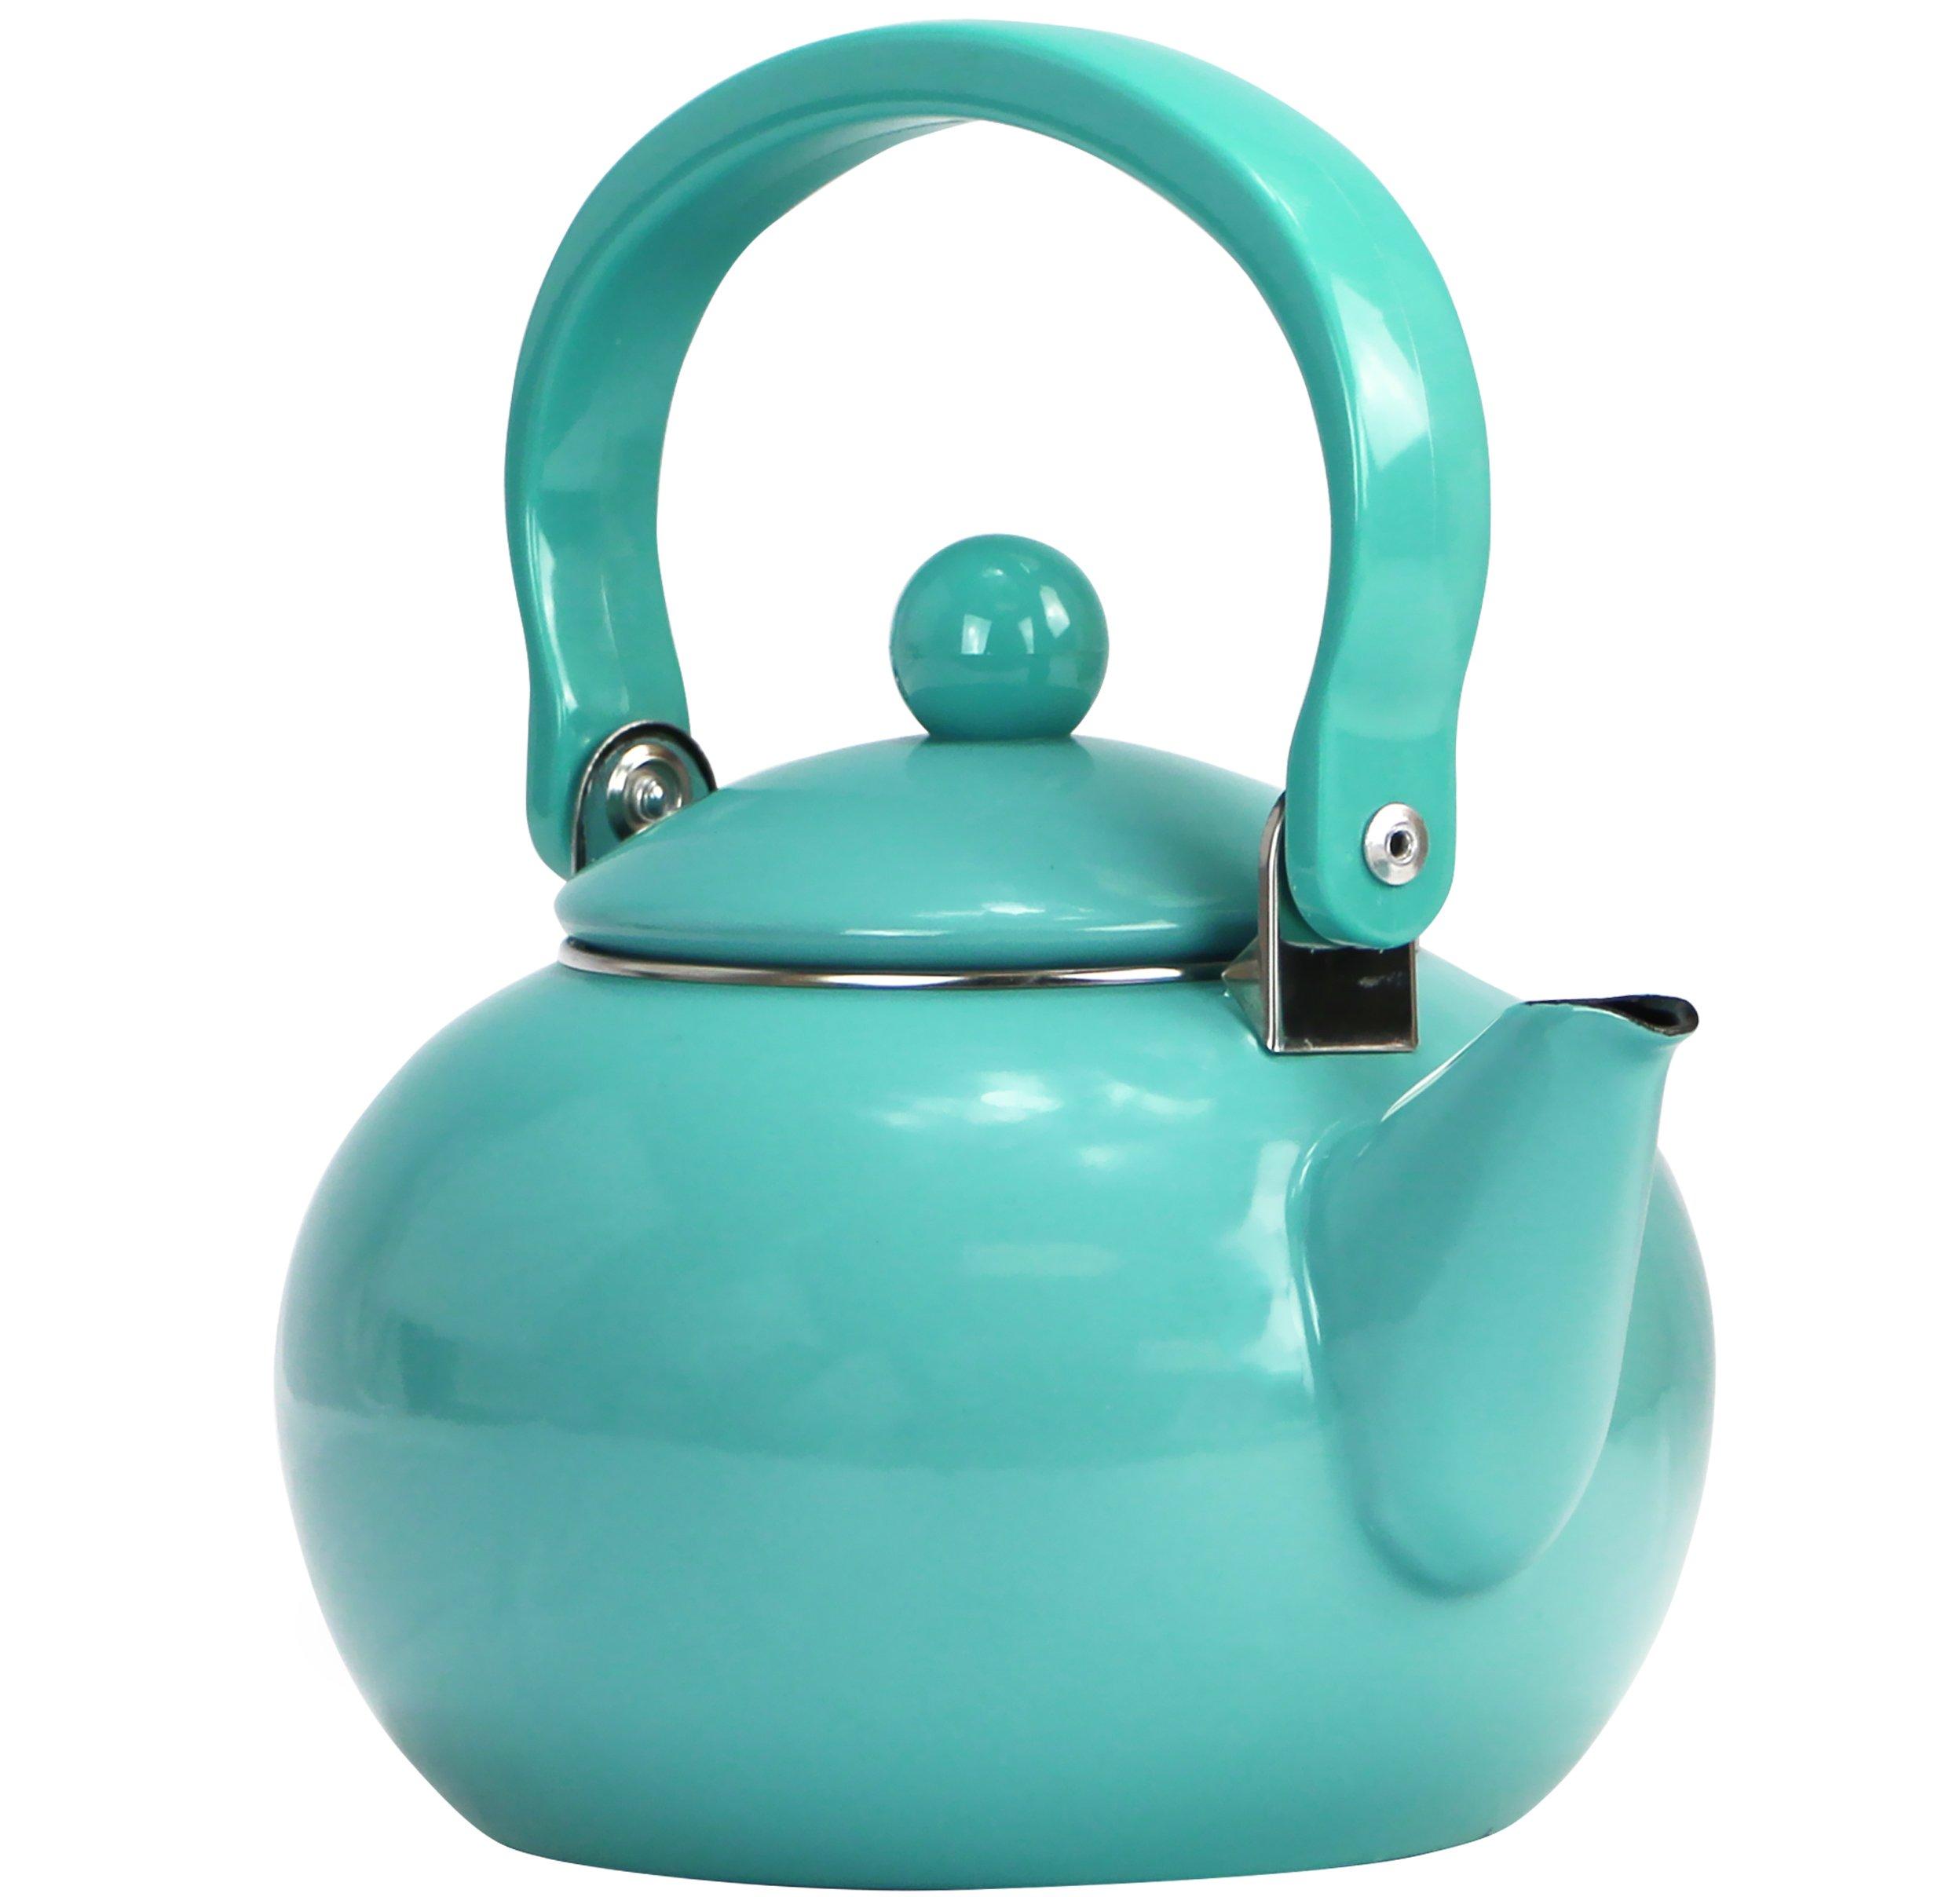 Calypso Basics by Reston Lloyd Enamel-on-Steel Tea Kettle, 2-Quart, Turquoise by Reston Lloyd